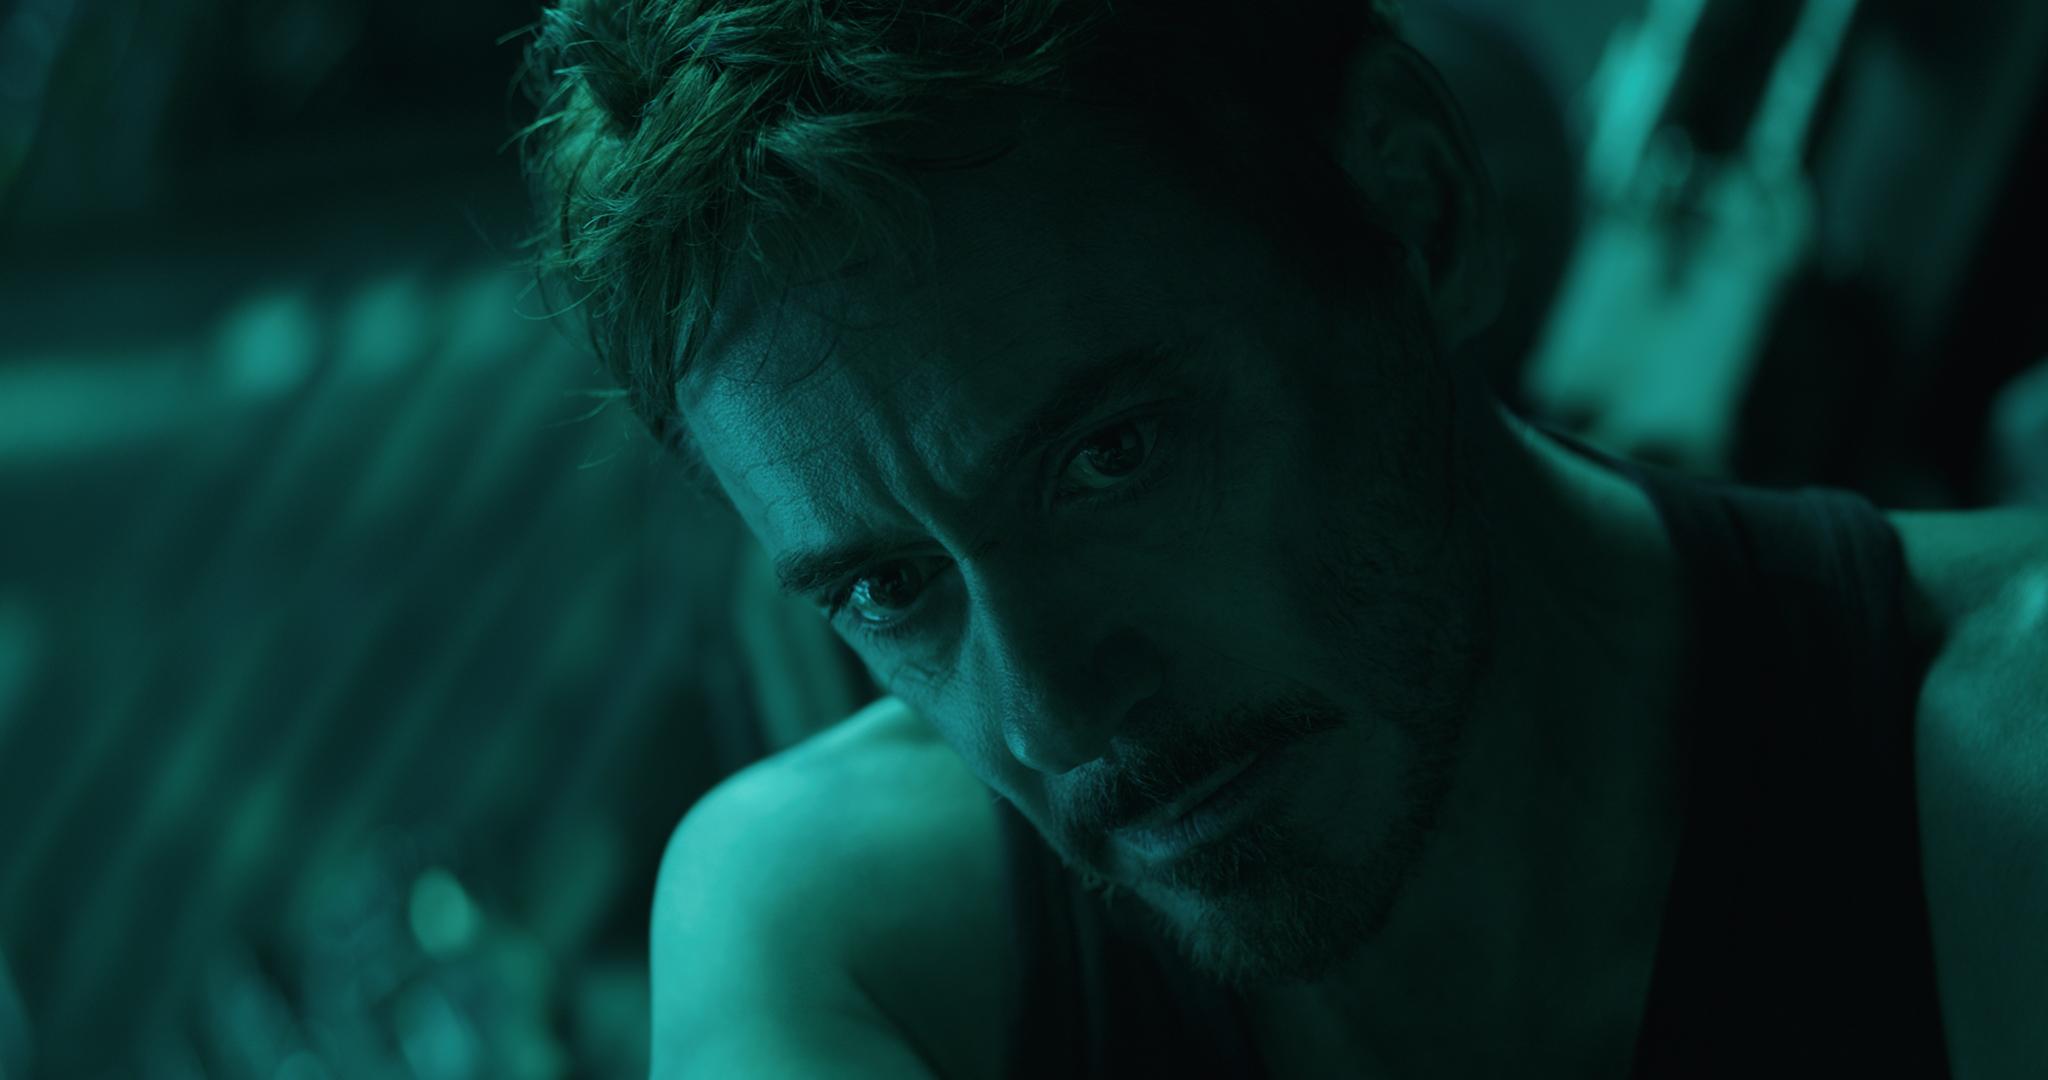 Still from 'Avengers: Endgame' featuring Tony Stark/Iron Man (Robert Downey Jr.).